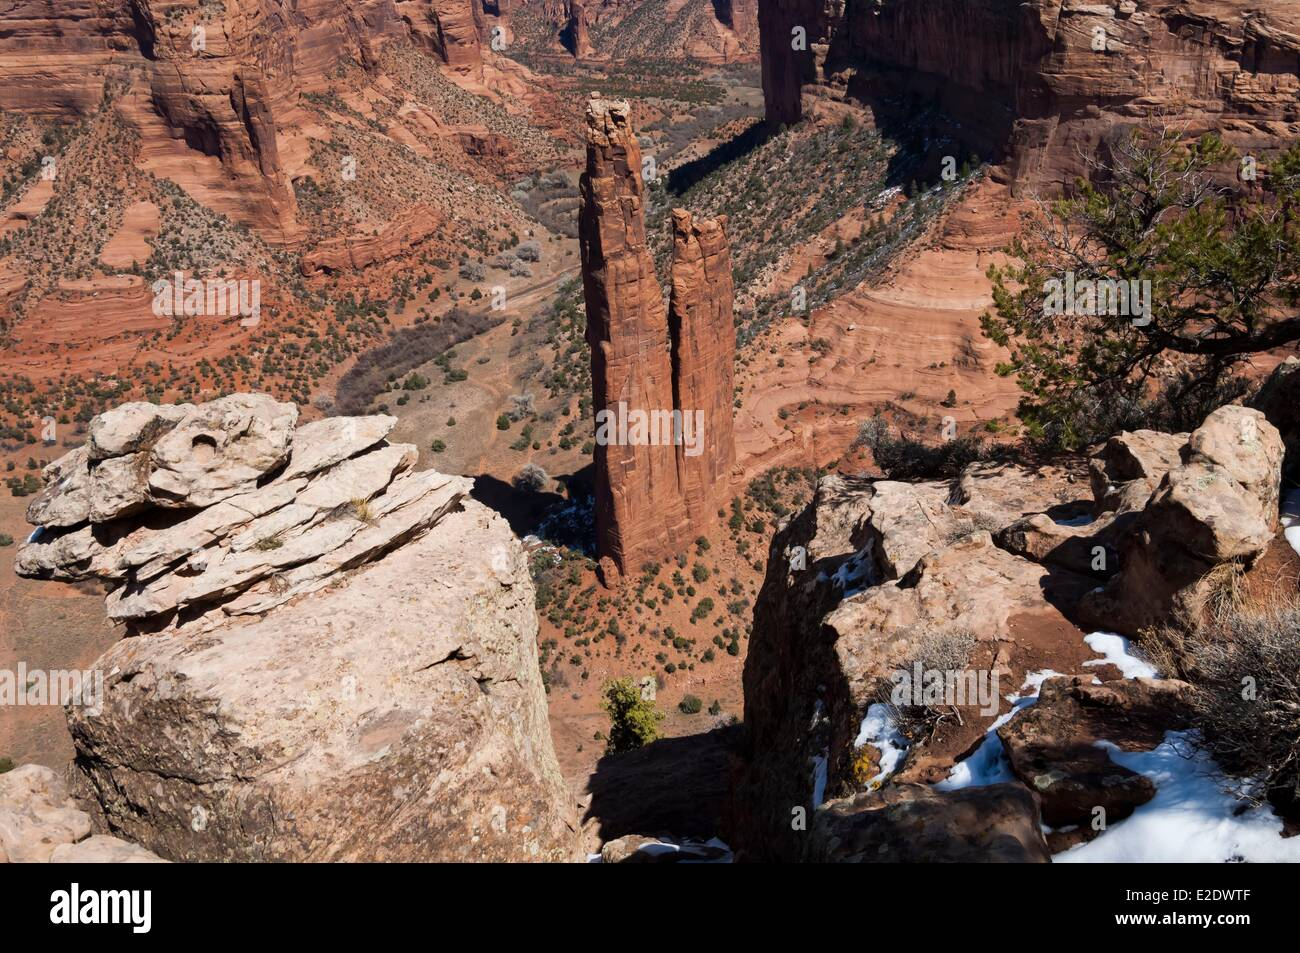 USA Arizona Canyon de Chelly Nationalmonument Stockbild